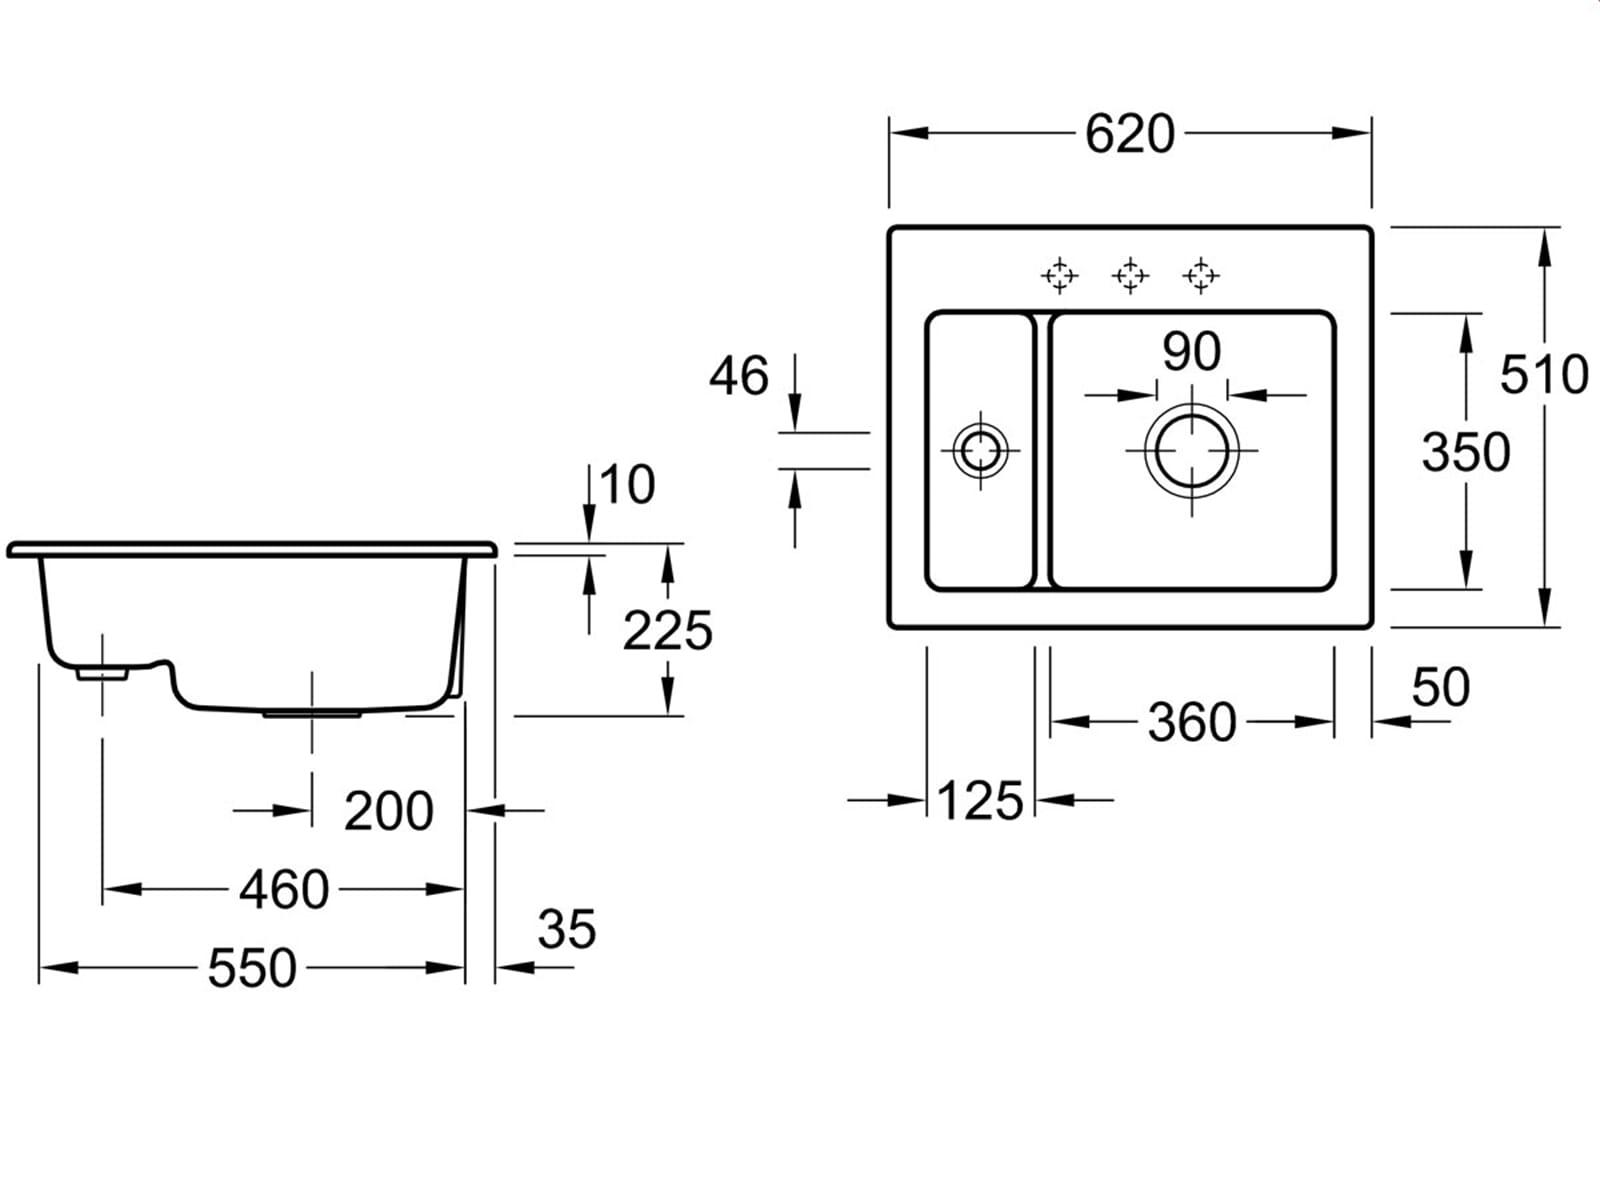 Villeroy & Boch Subway 60 XM Almond - 6780 01 AM Keramikspüle Handbetätigung